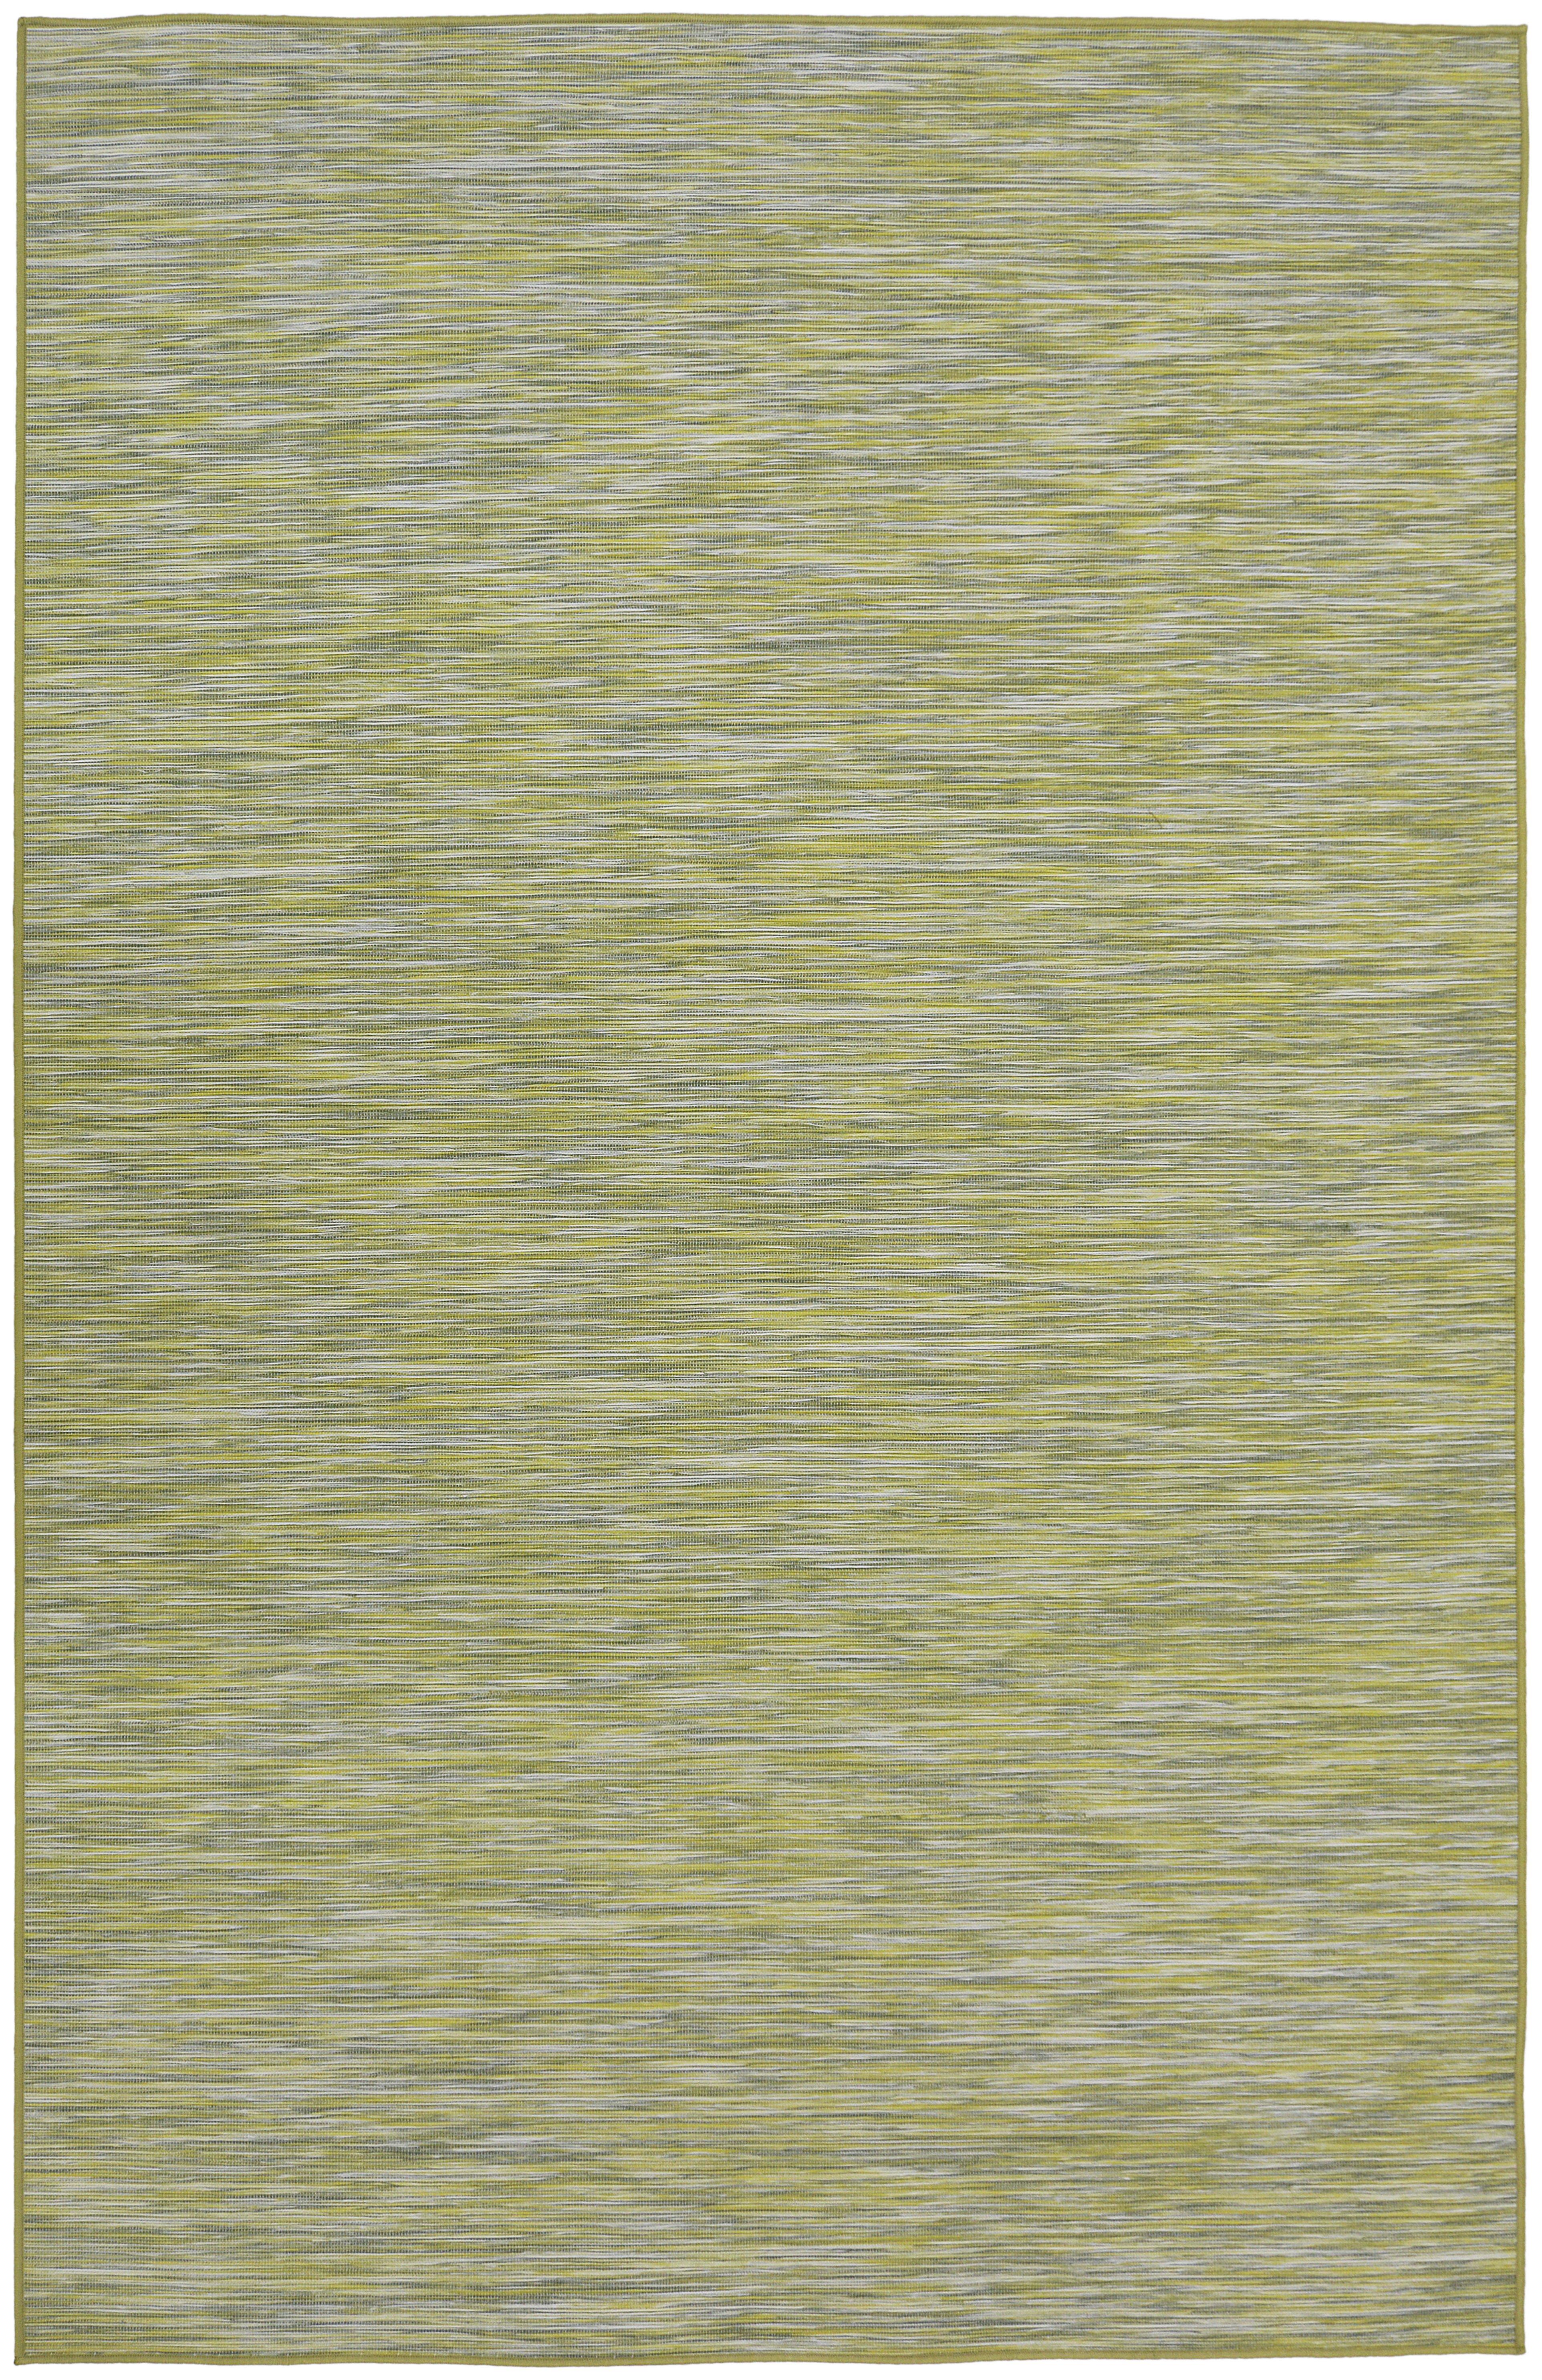 Image of Retreat Flatweave Reversible Rug - 160x230cm - Lemongrass